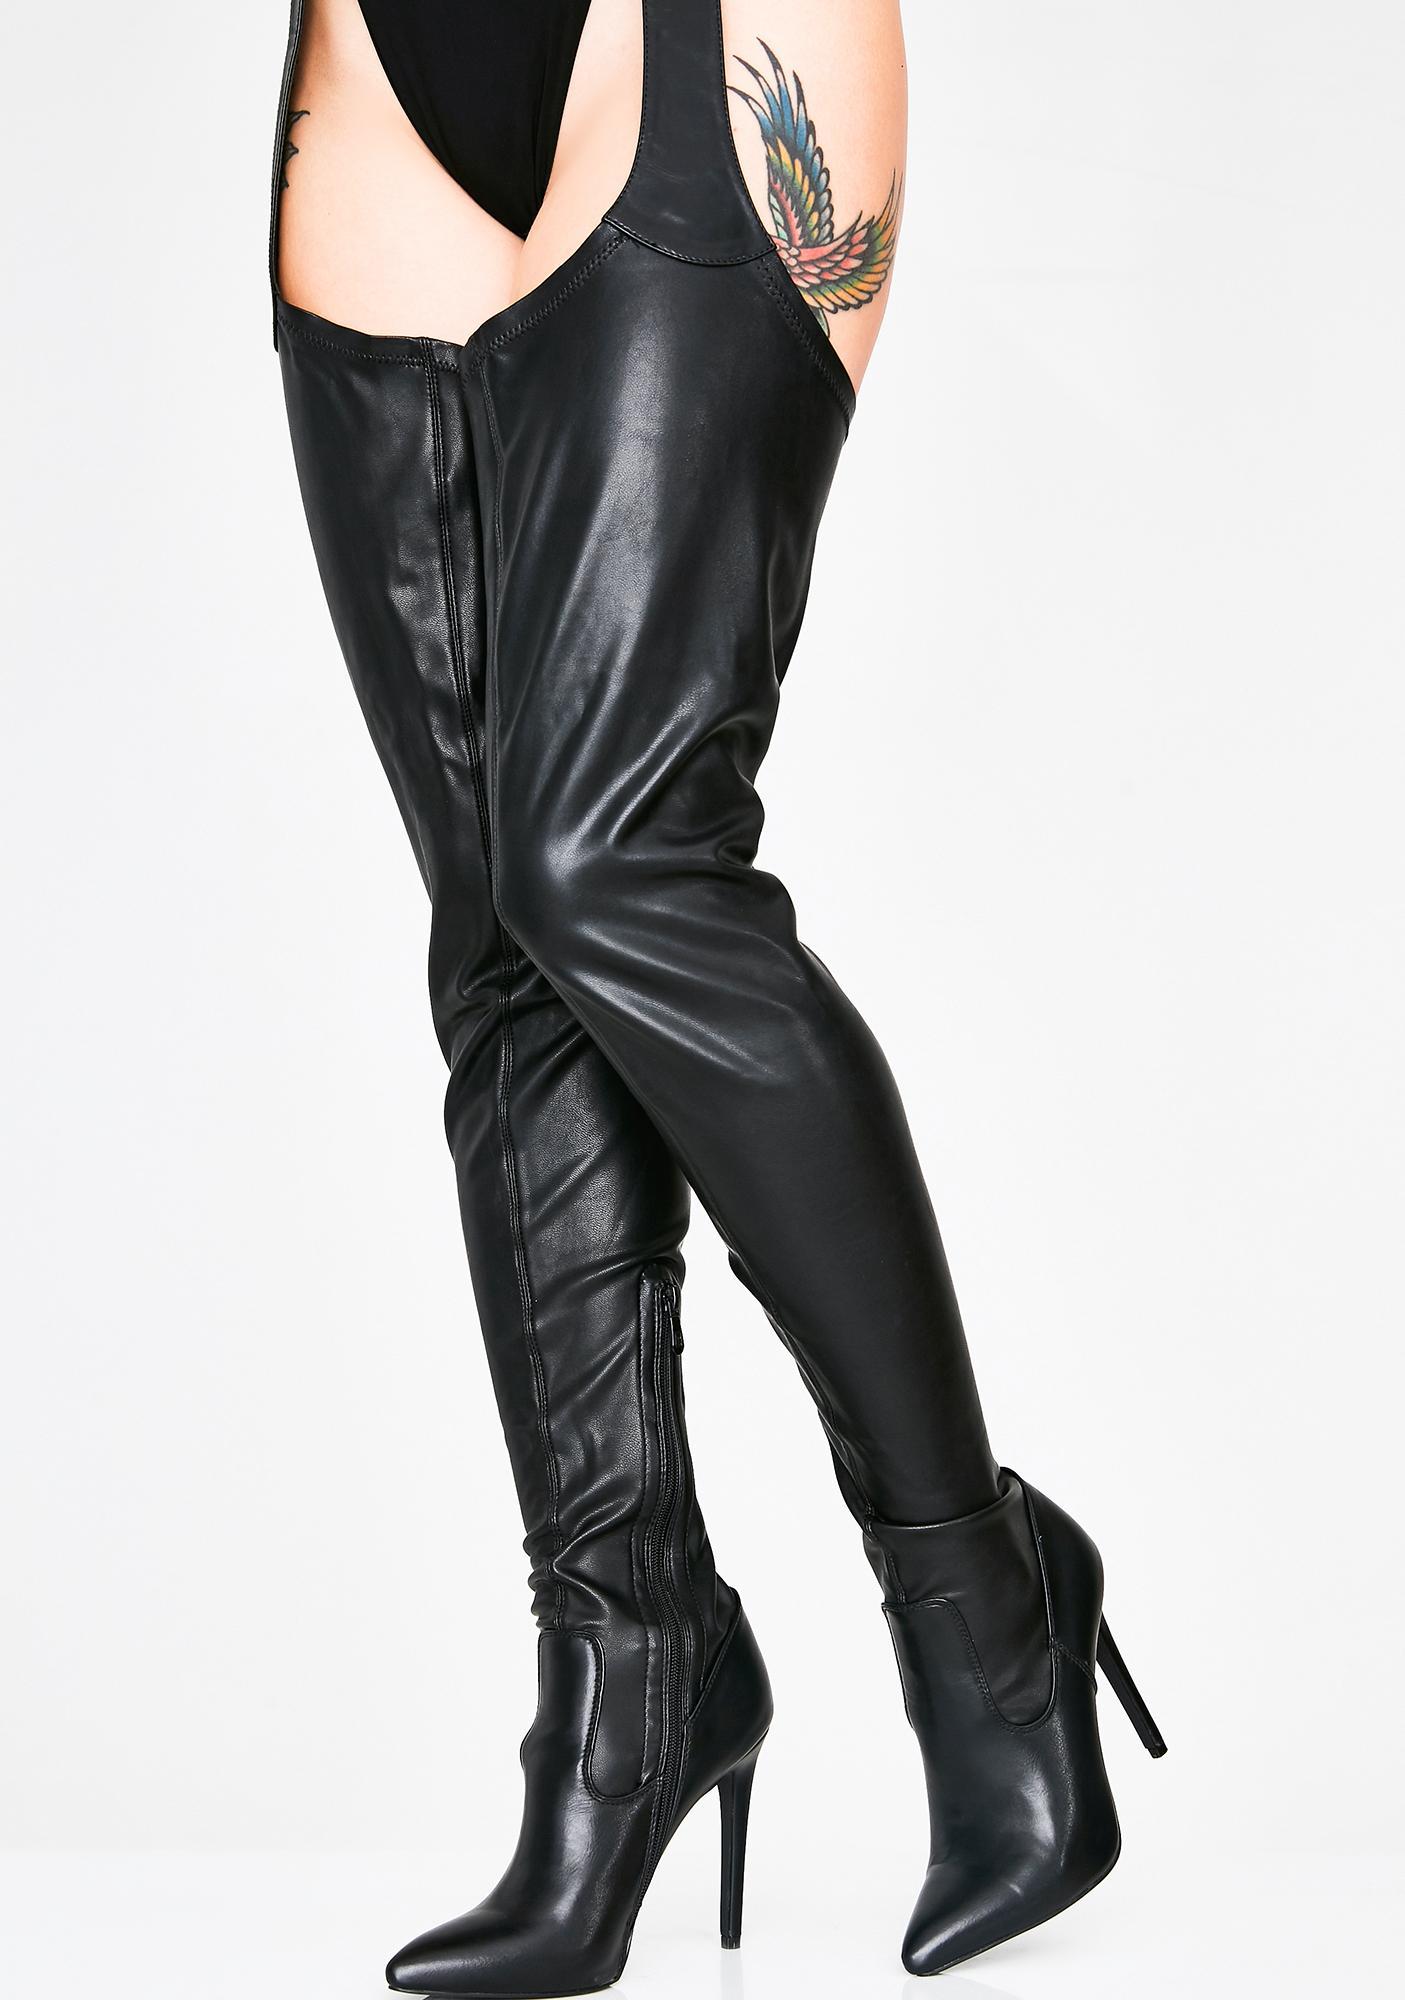 AZALEA WANG Westloop Chap Boots